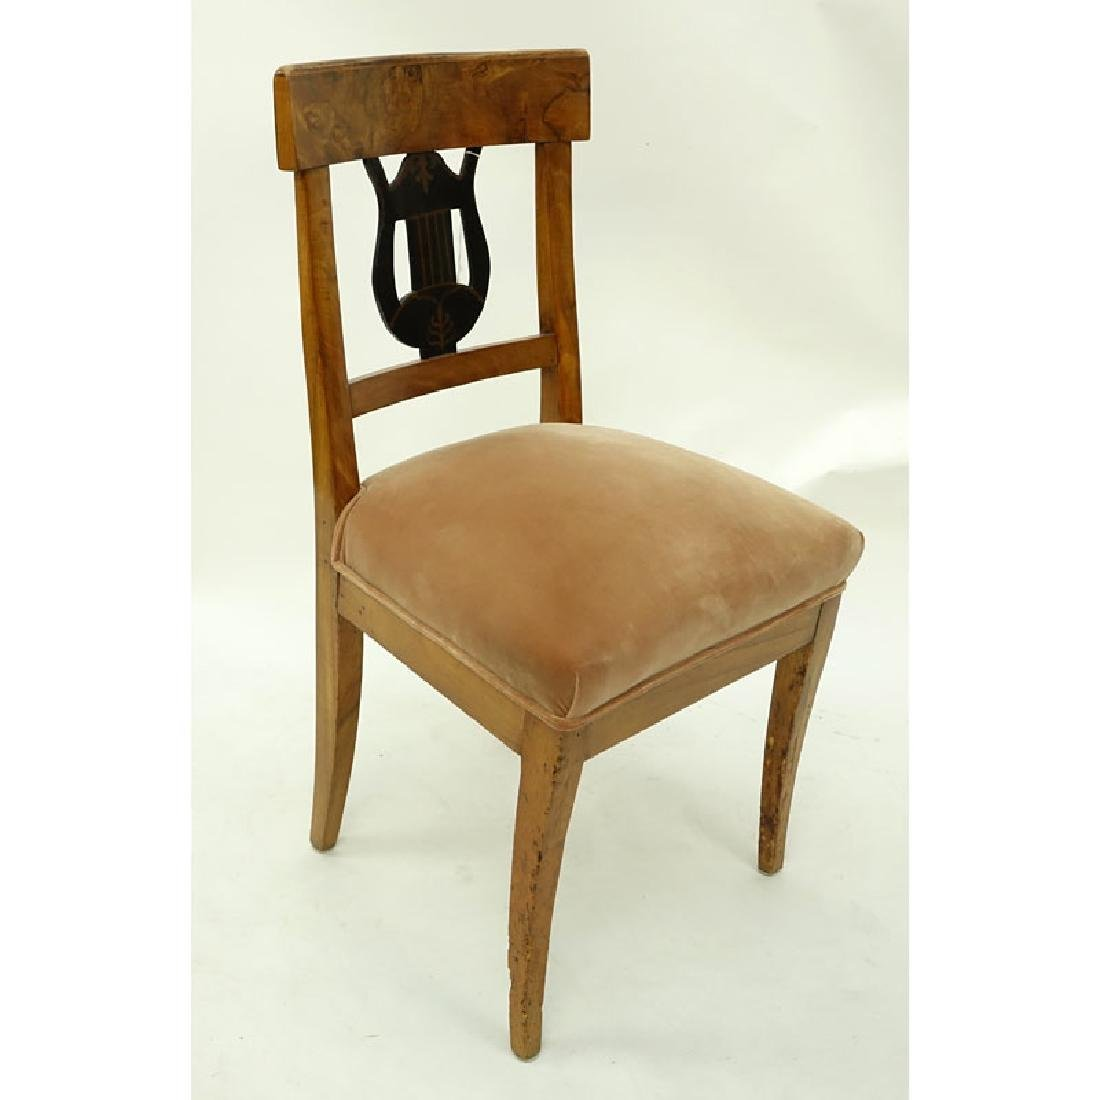 Antique Italian Burlwood Upholstered Side Chair.